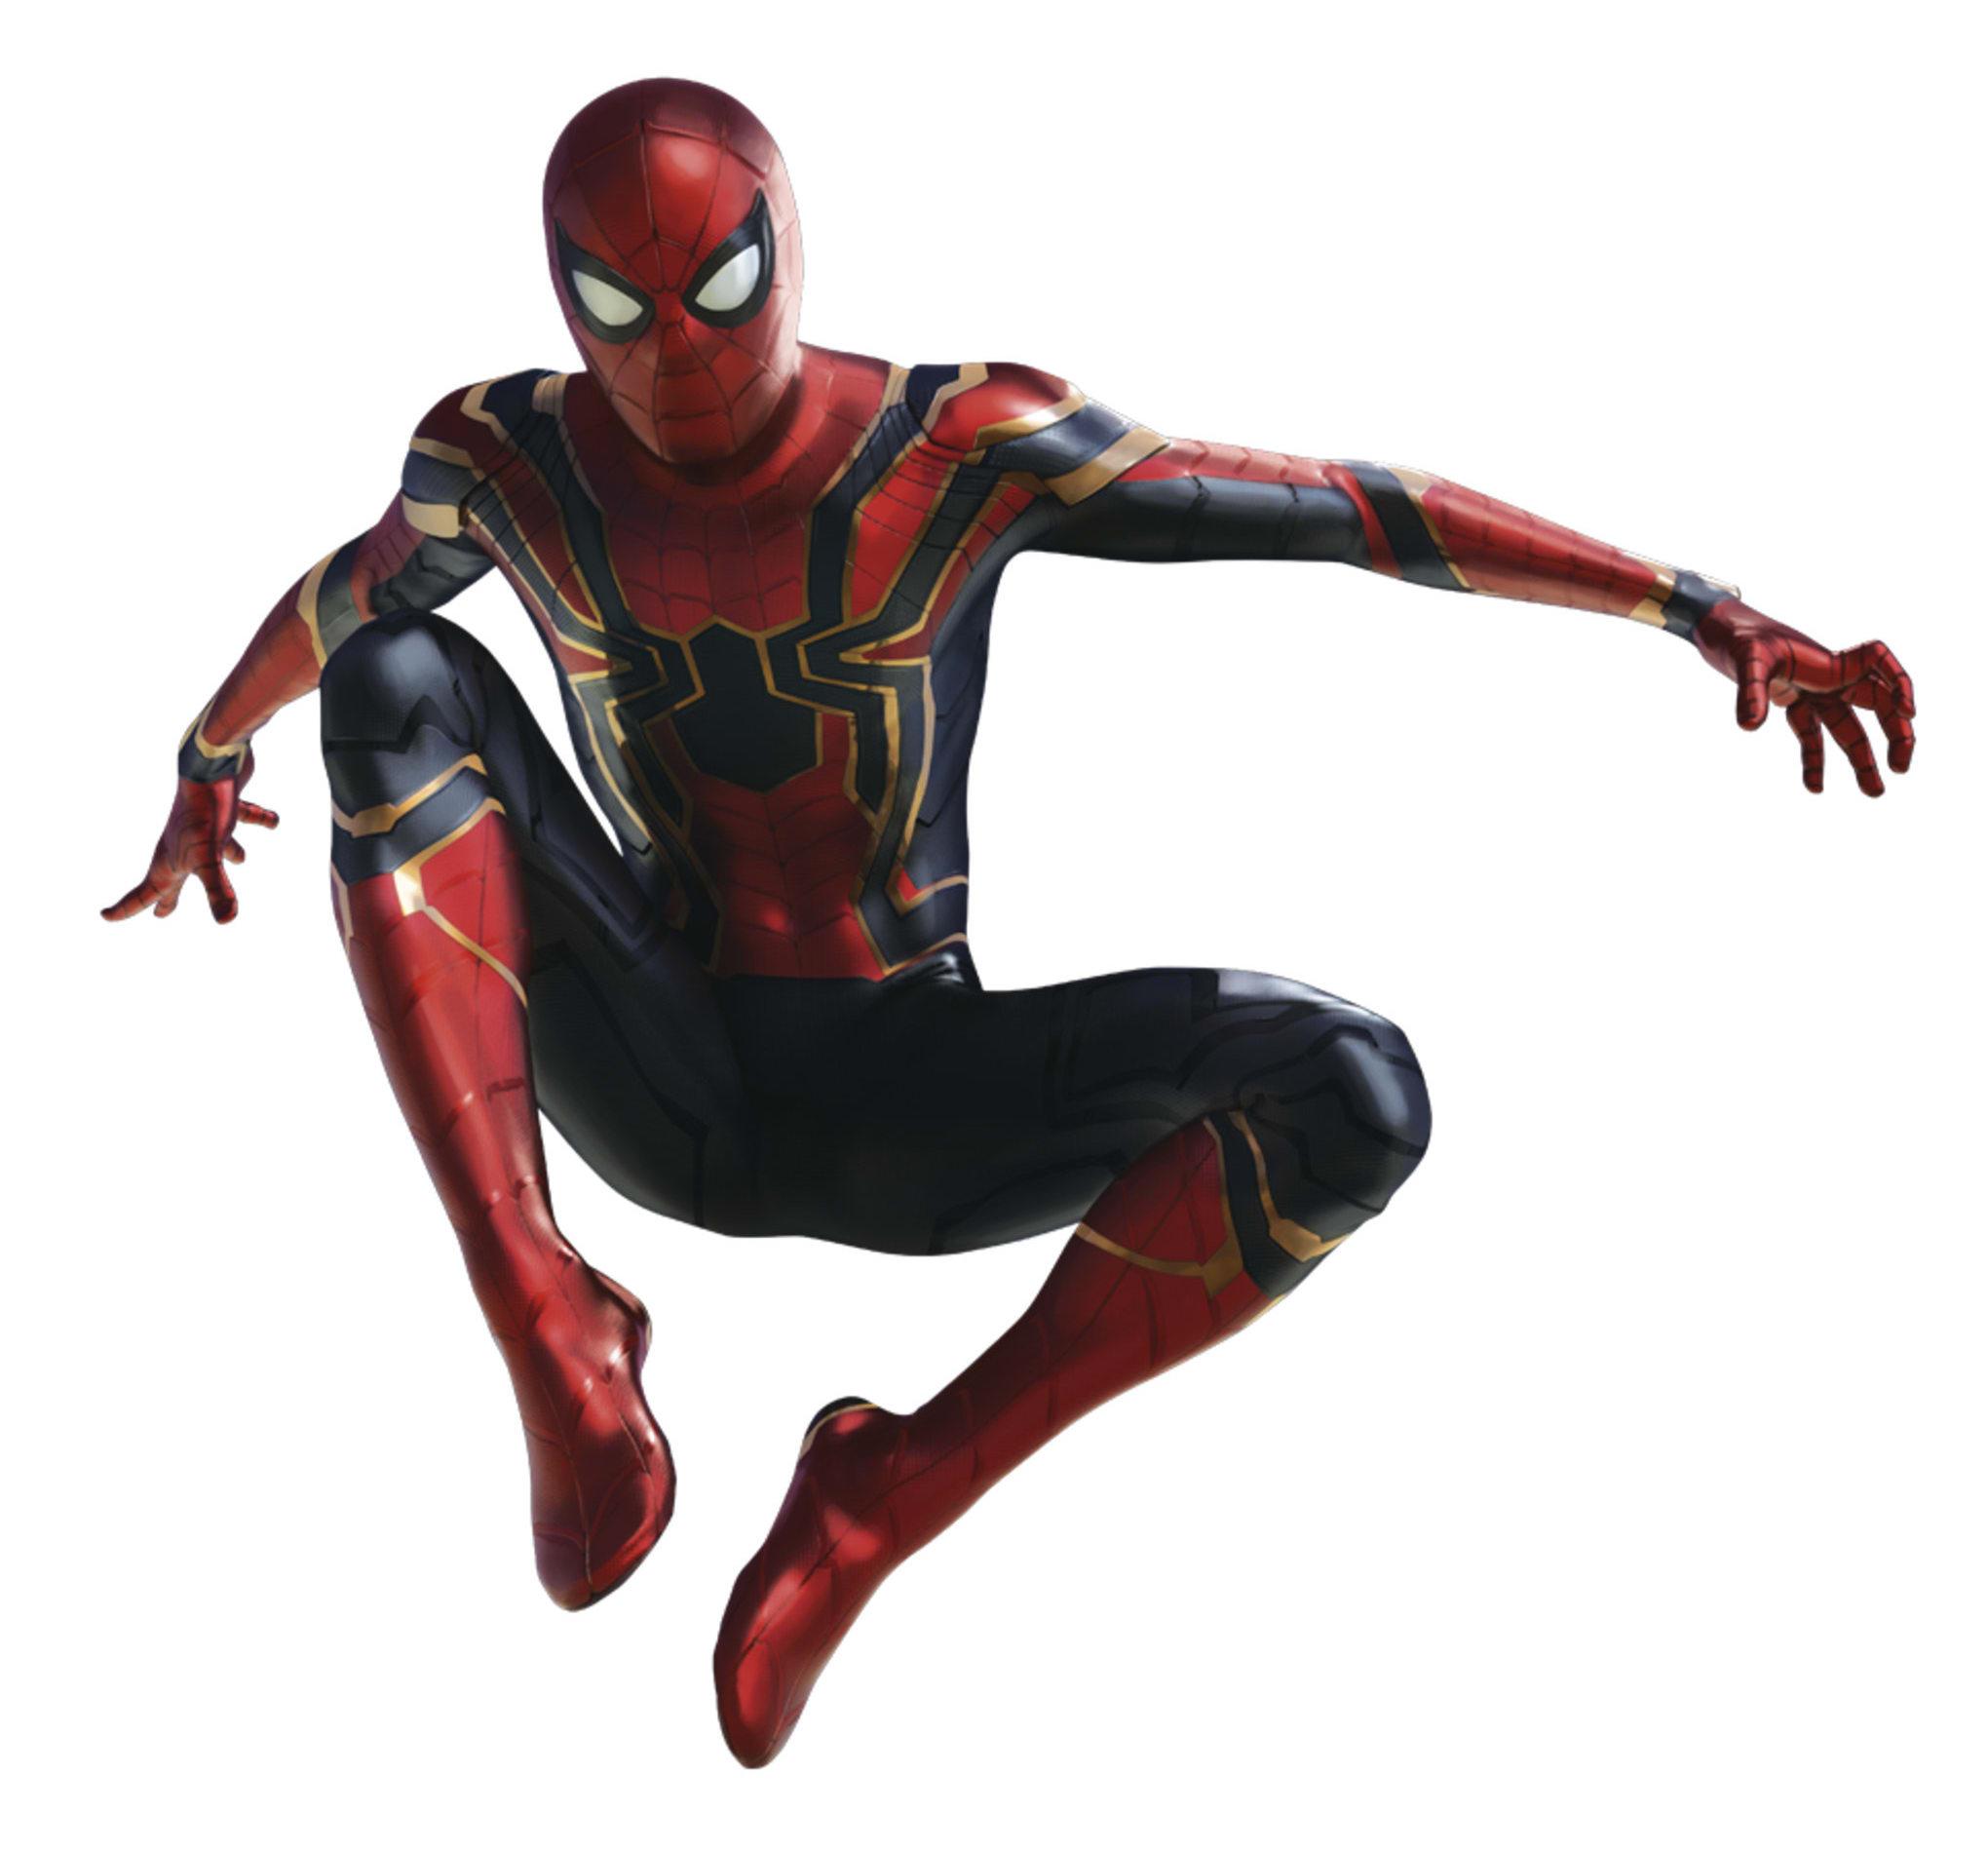 Iron Spider Infinity War Png Motorsiklet Duvar Kagitlari